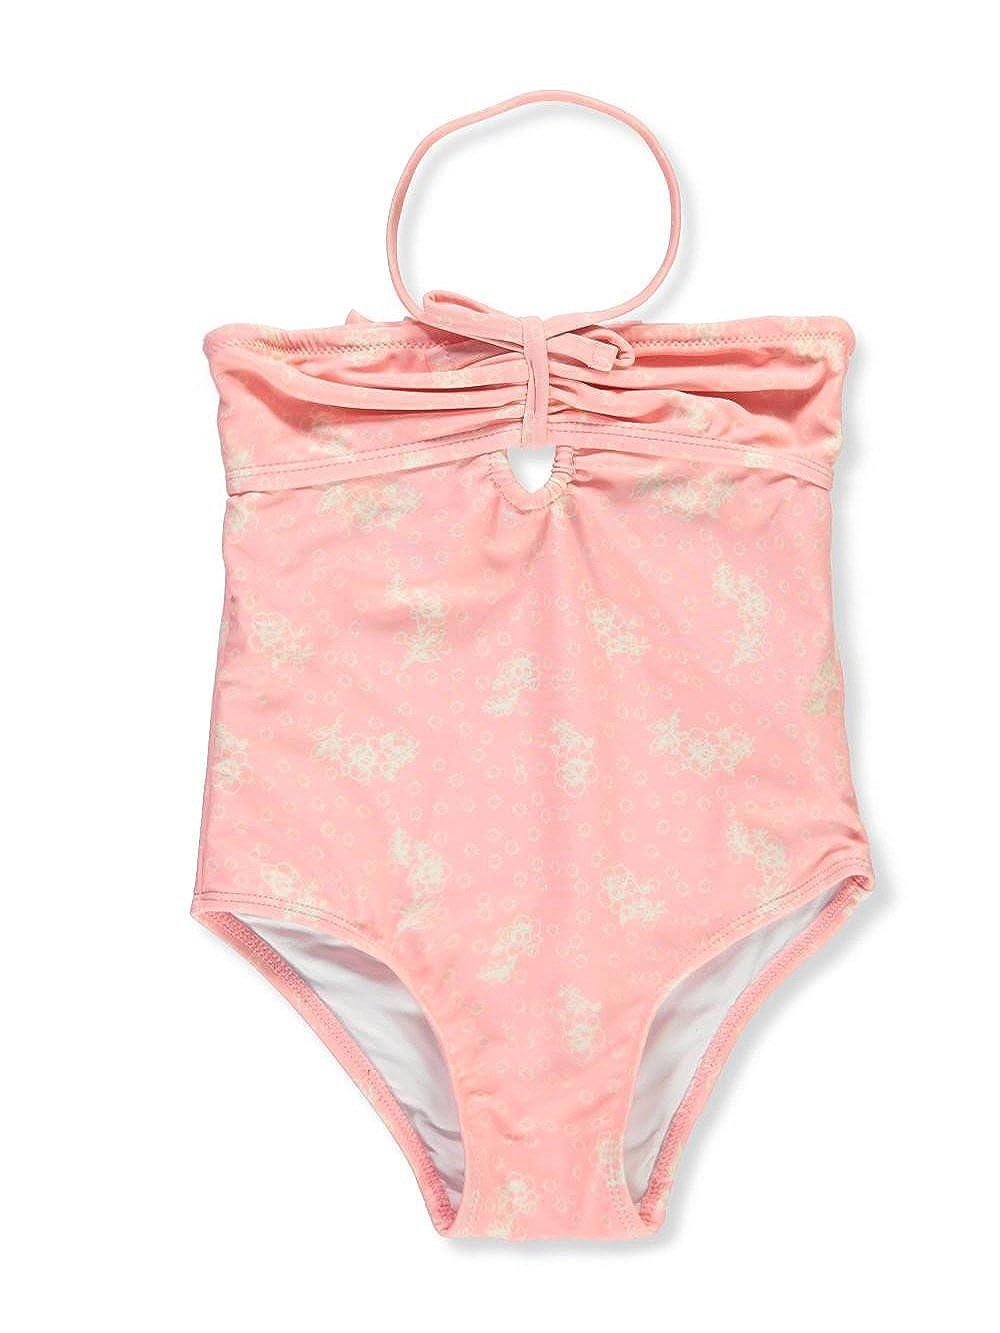 Jessica Simpson Baby Girls' 1-Piece Swimsuit